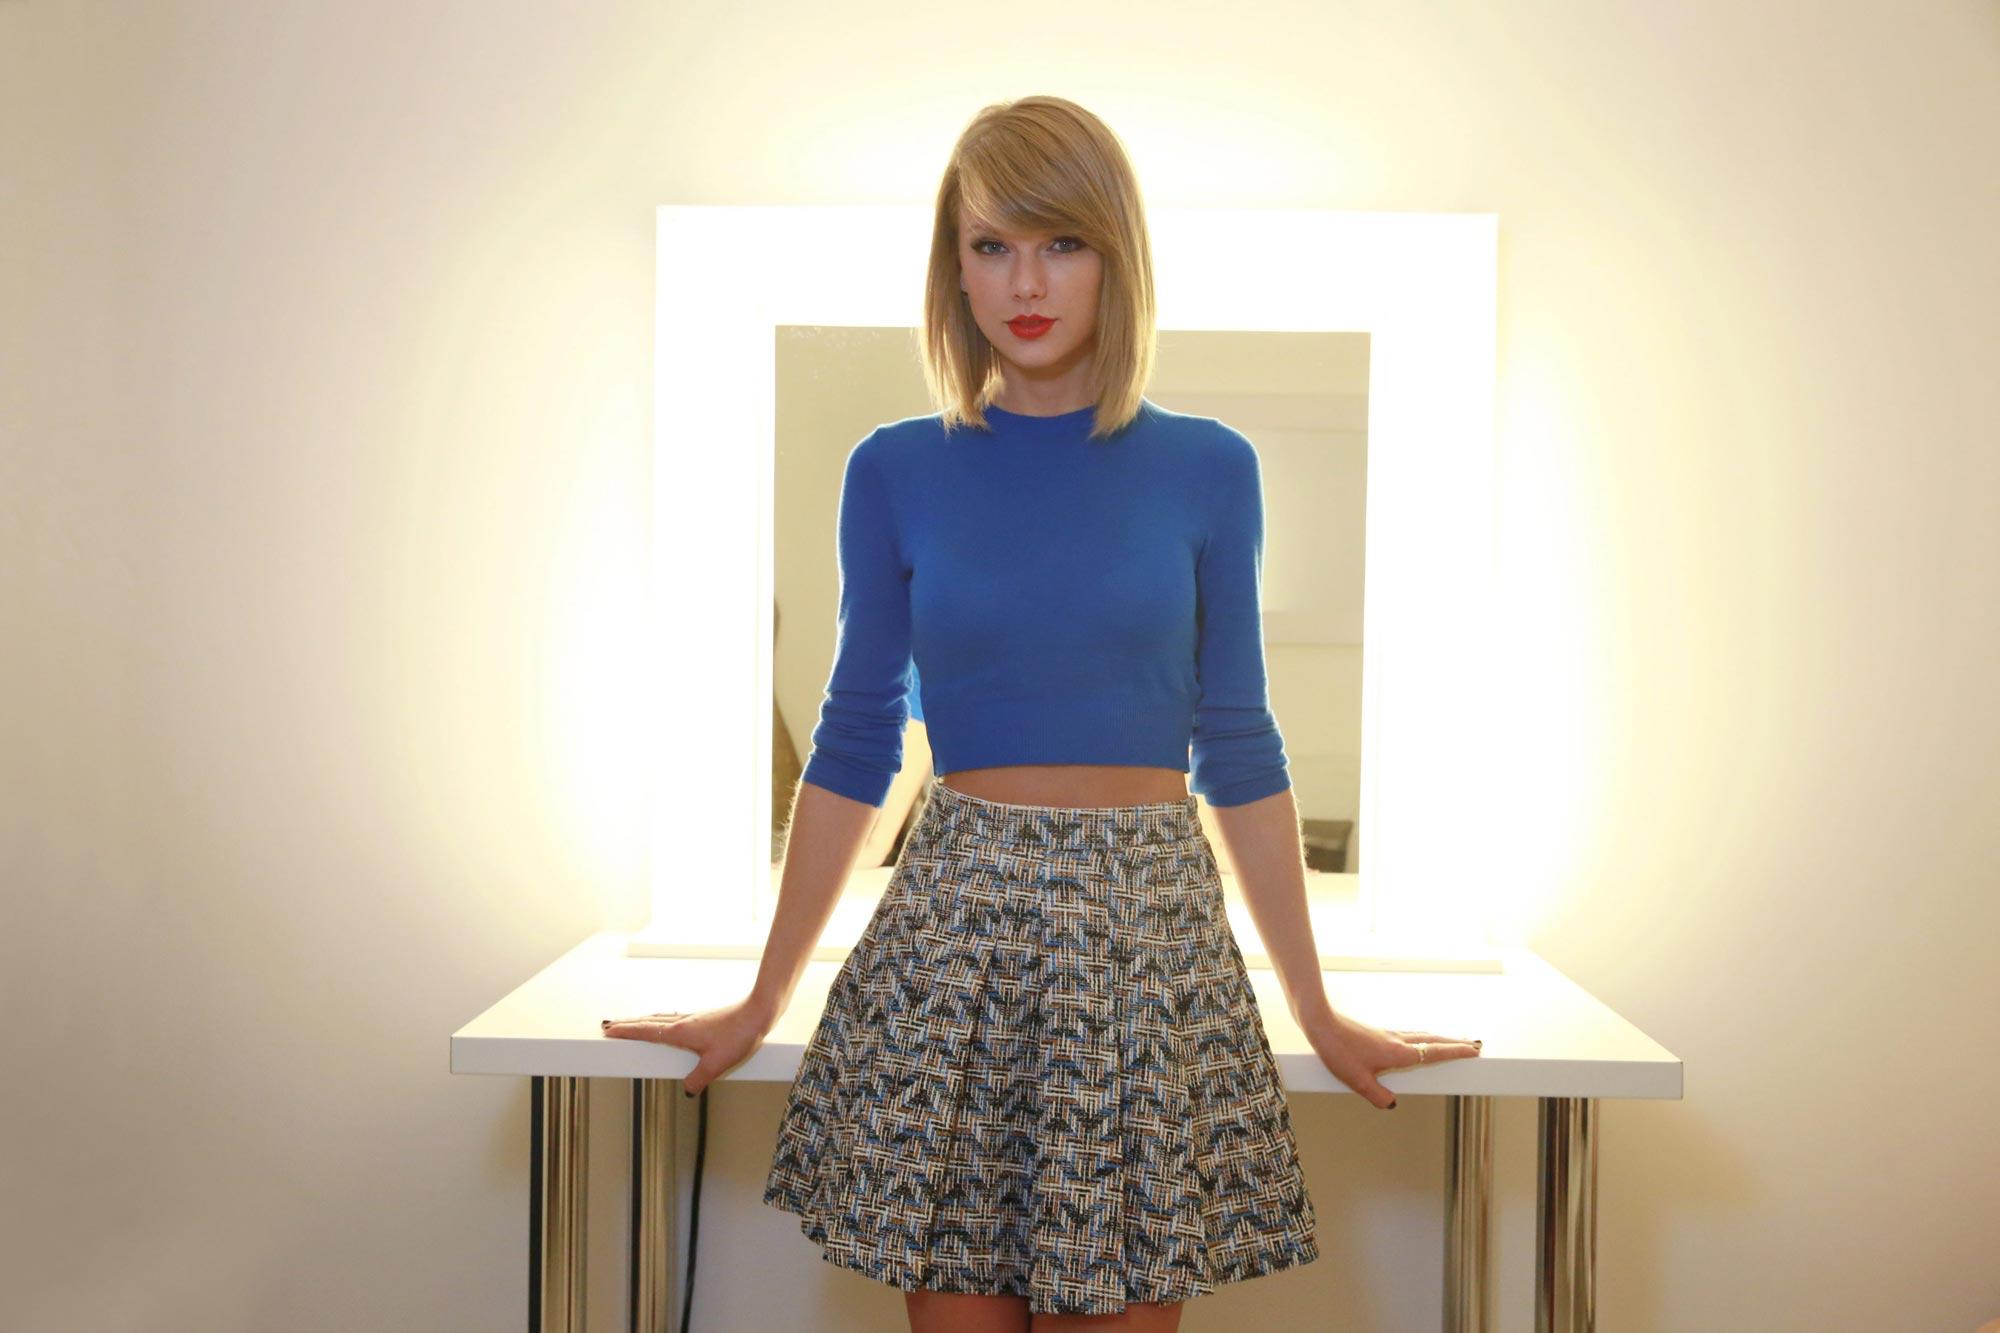 Taylor Swift oc 02